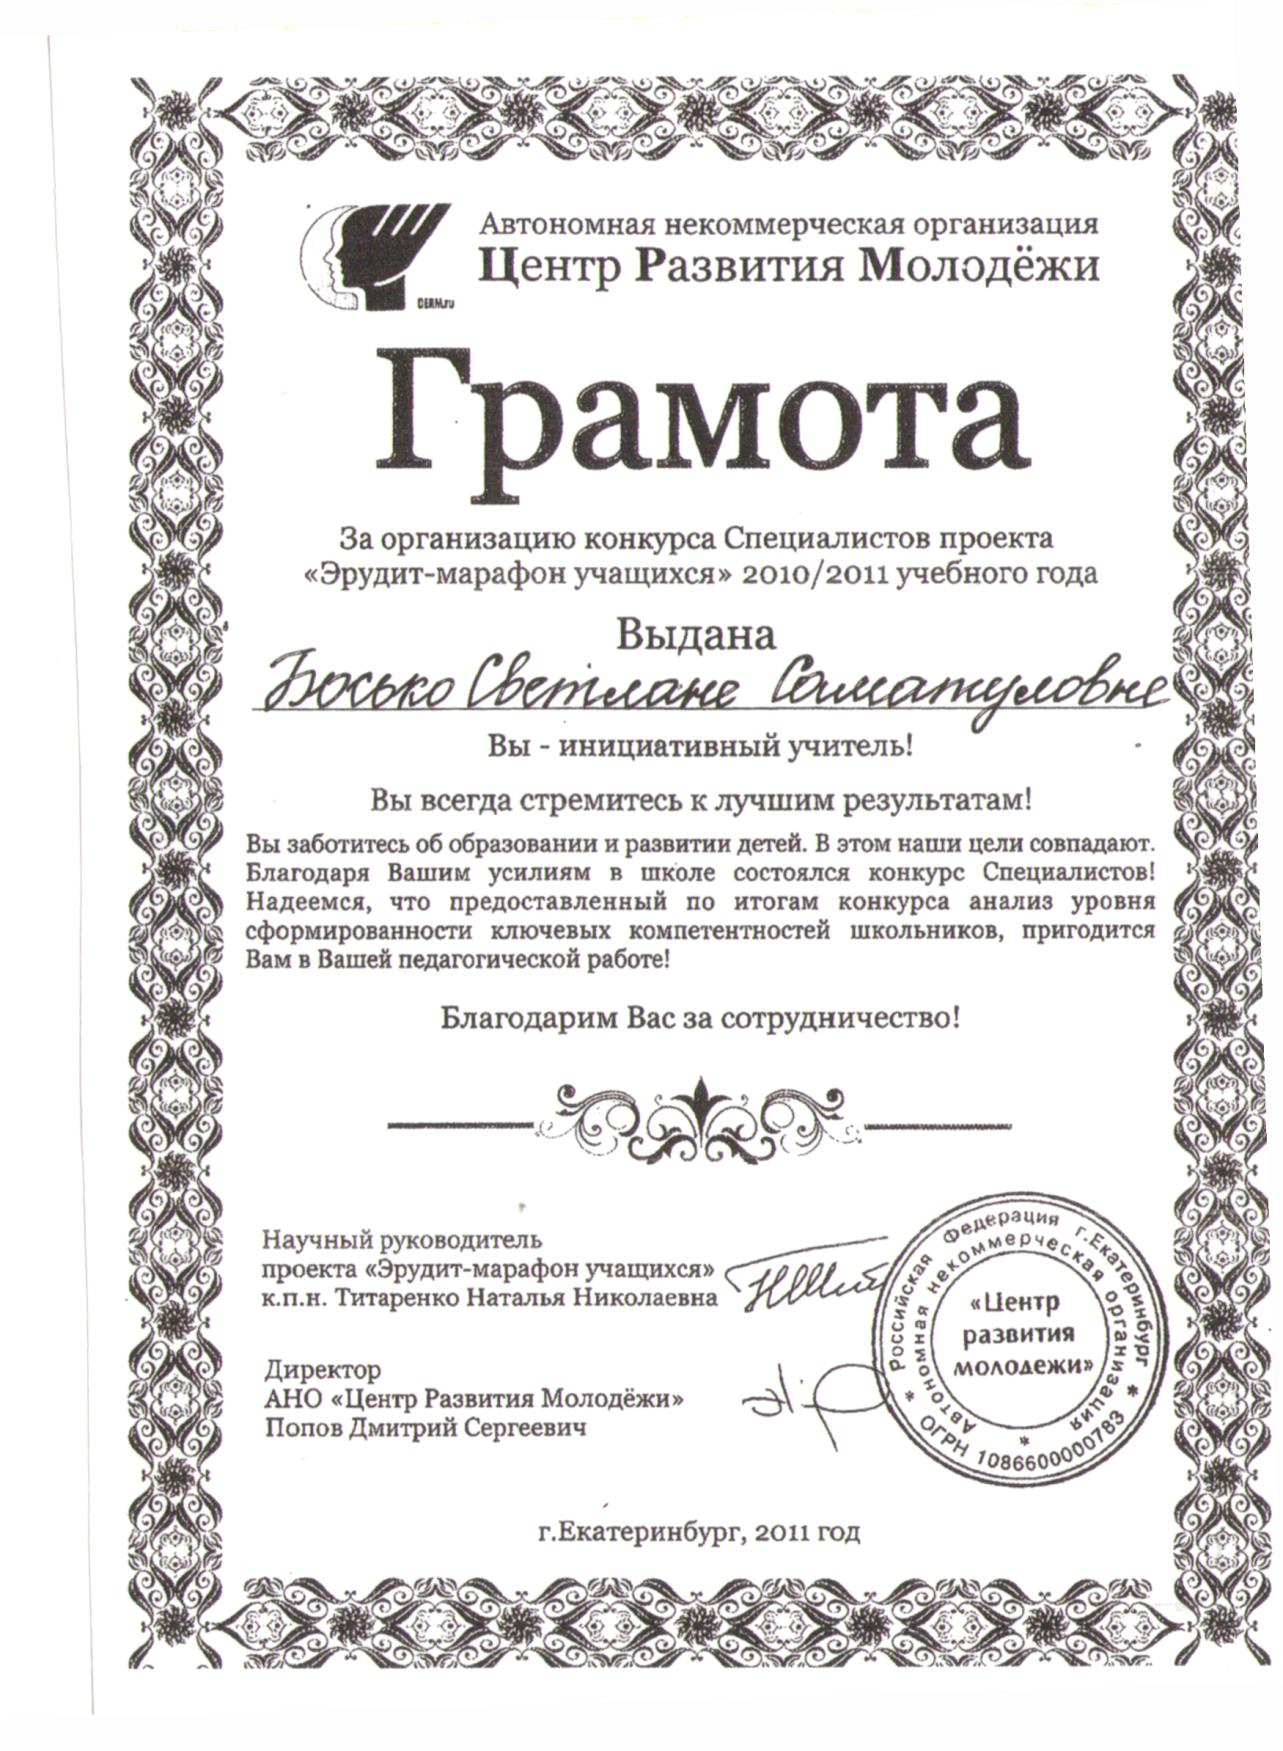 C:\Documents and Settings\Светлана Саматуловна\Рабочий стол\квалификация\11 грамота0002.tif